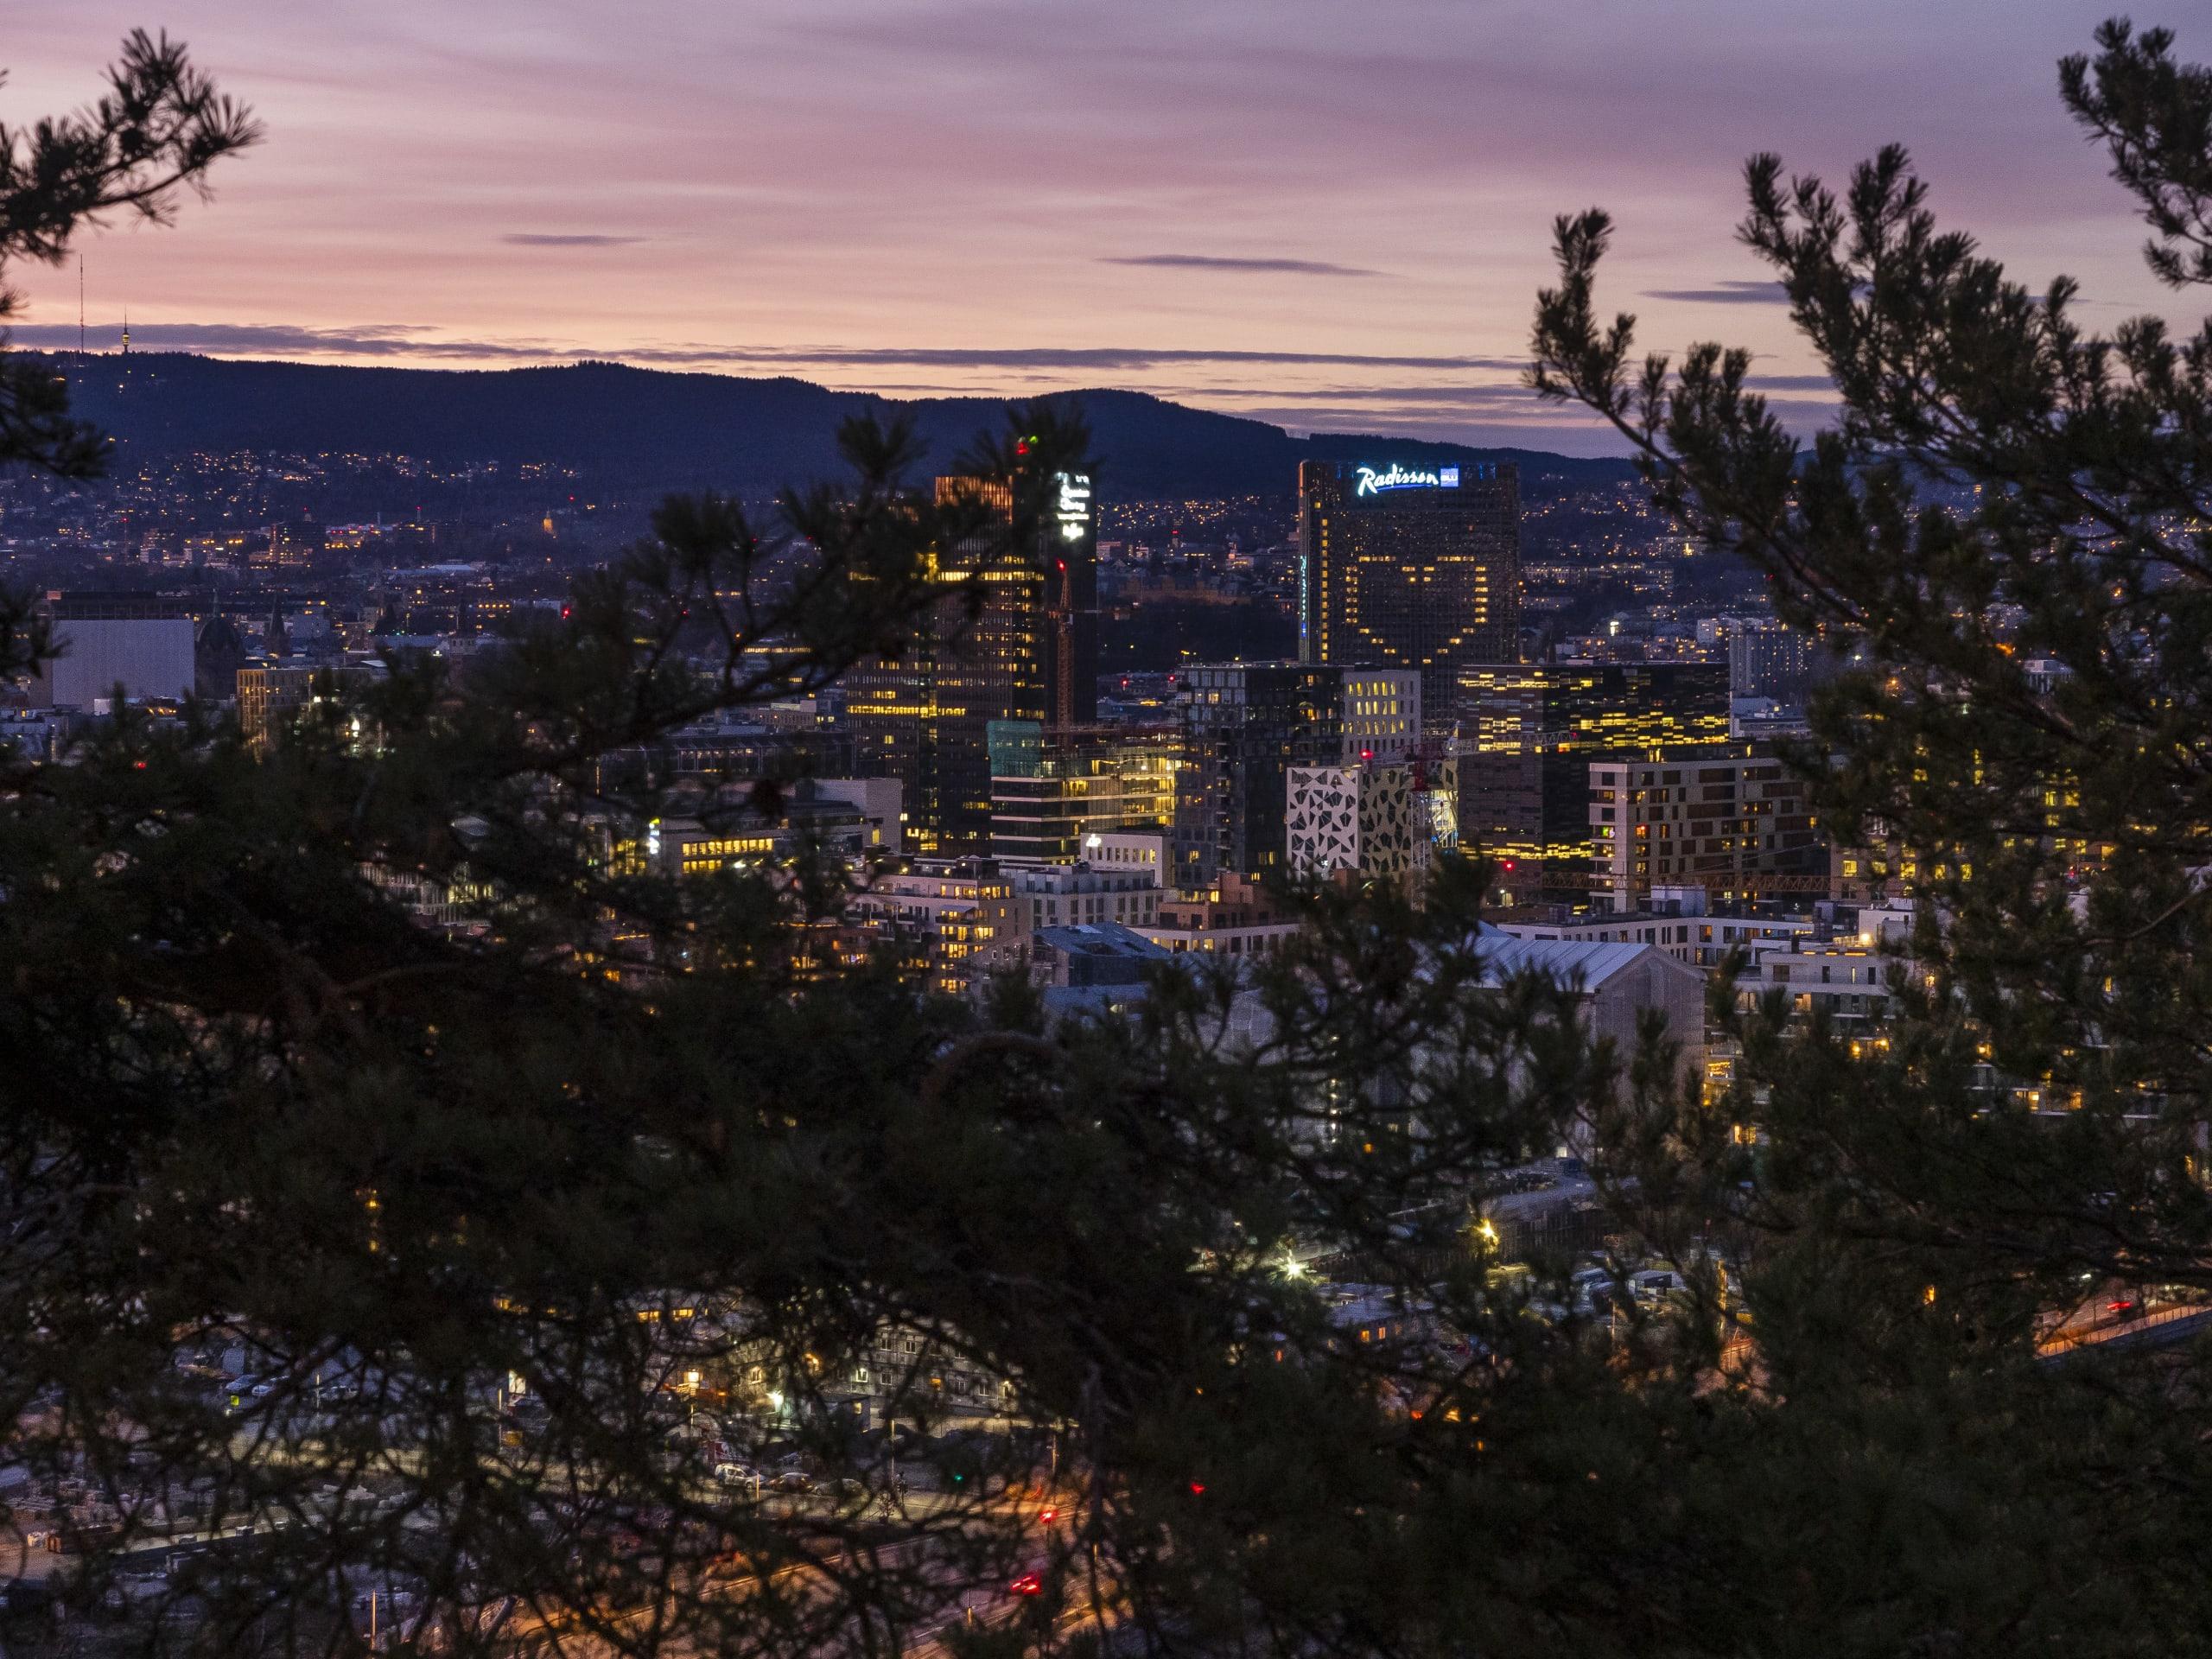 Ekeberg sculpture park in Oslo